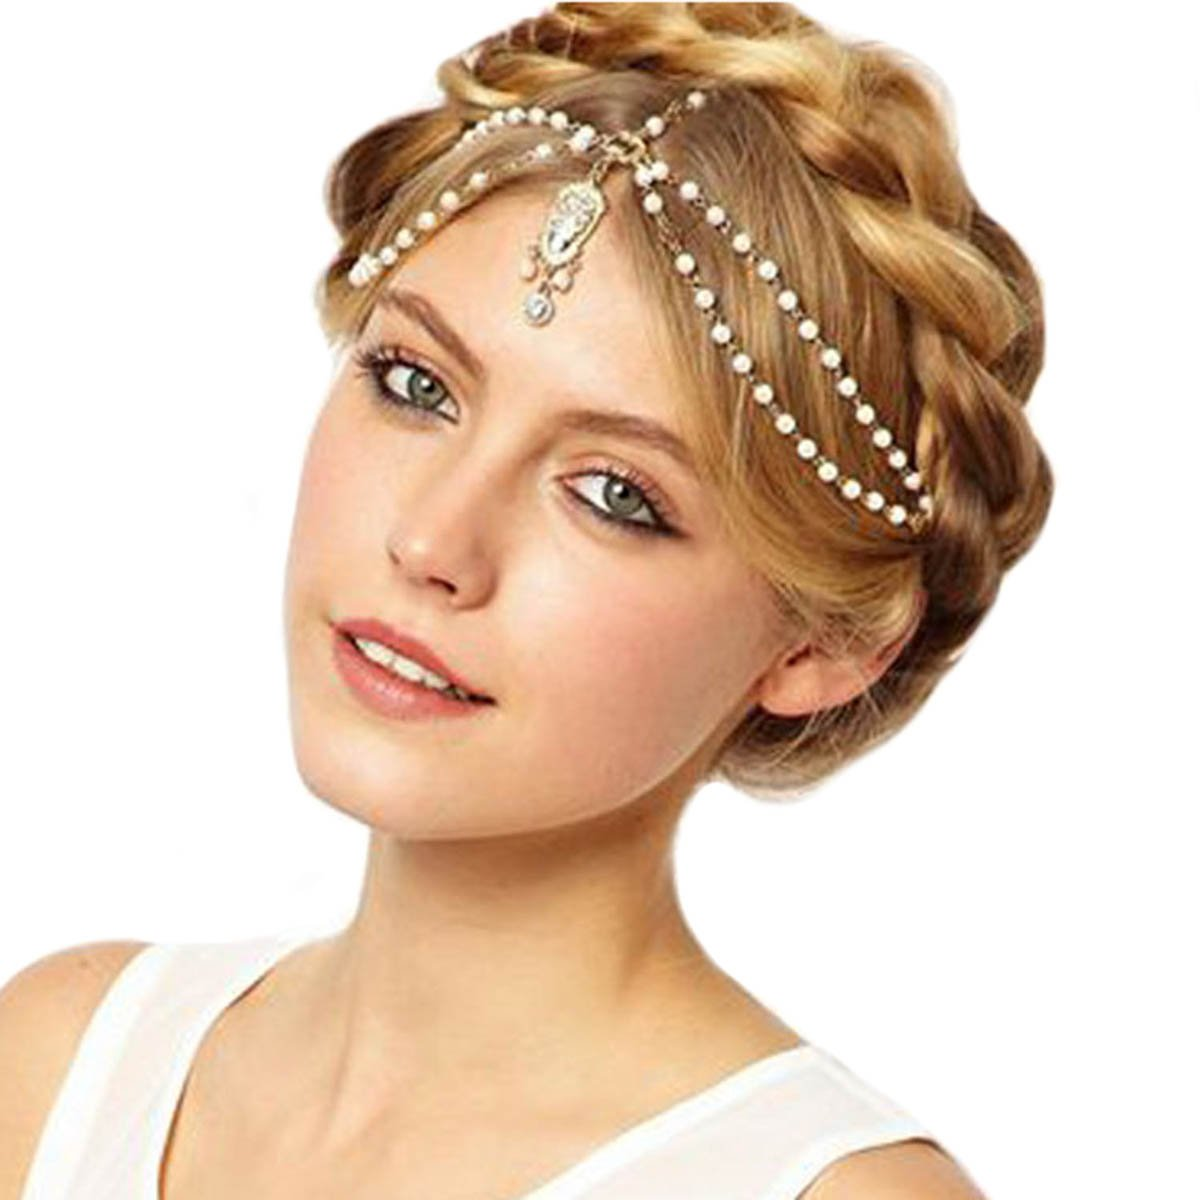 Aukmla White Indian Chain Hair Jewelry Boho